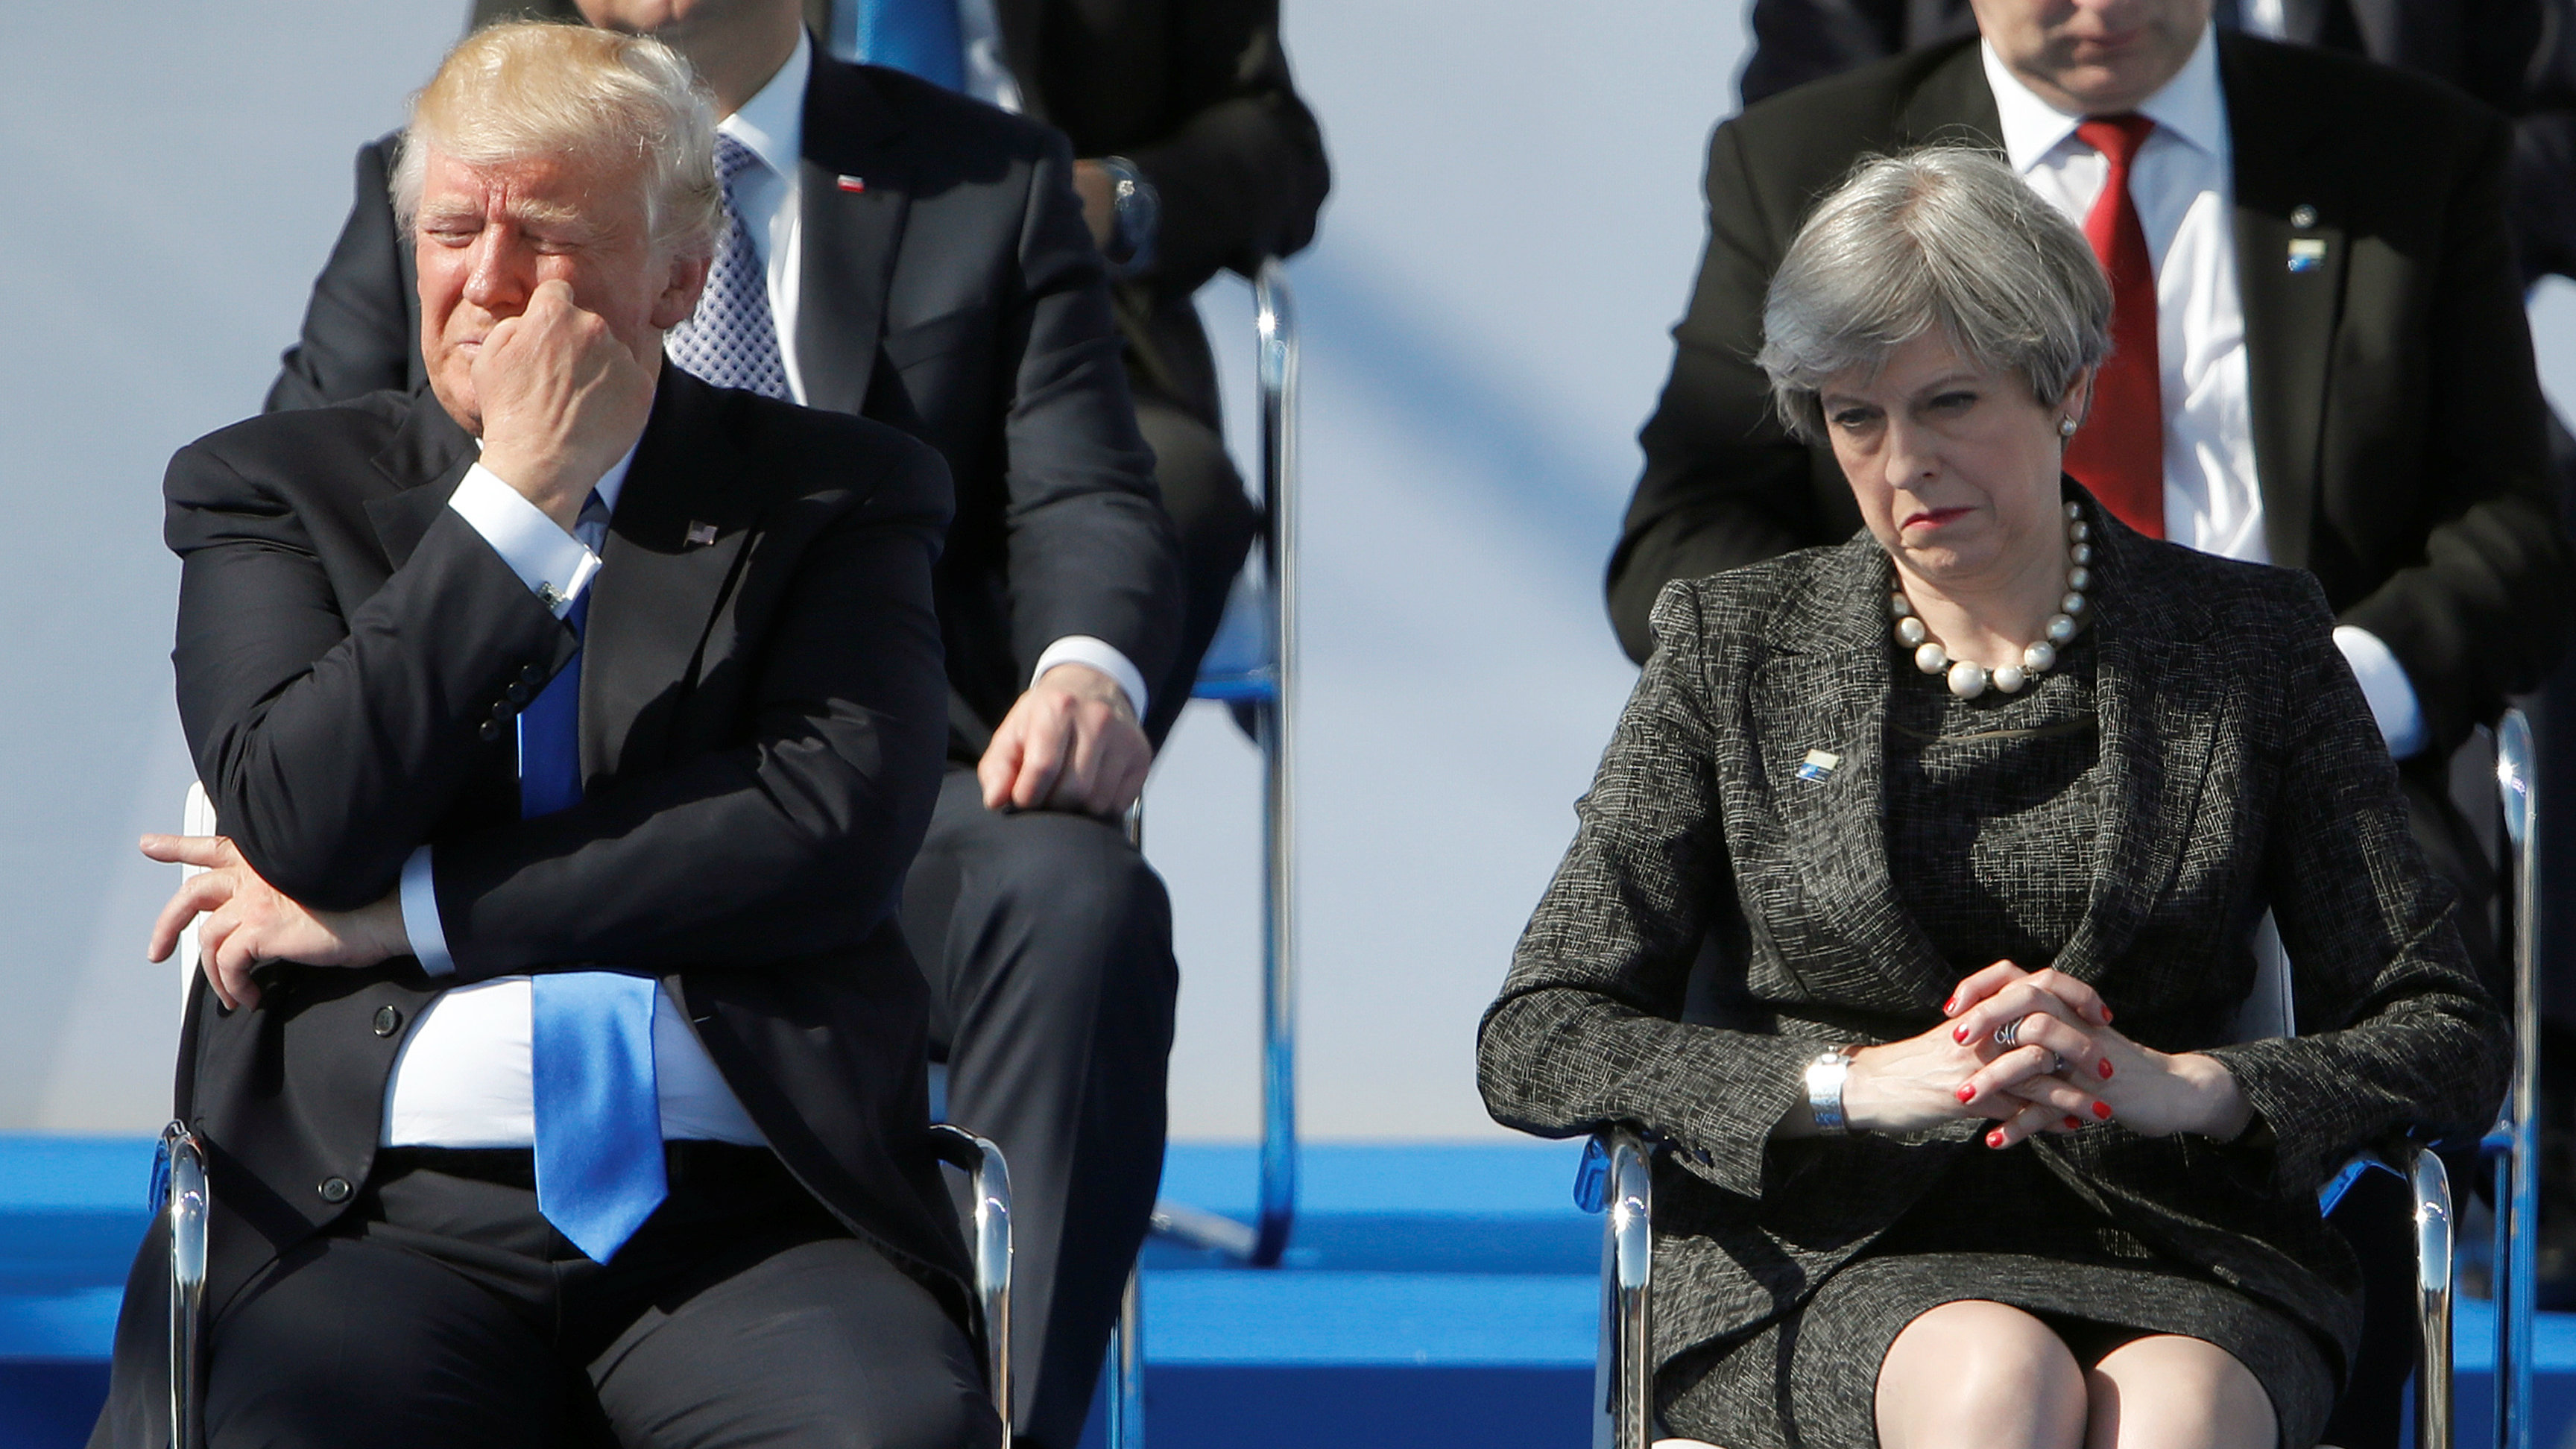 US President Donald Trump and British Prime Minister Theresa May at NATO meeting